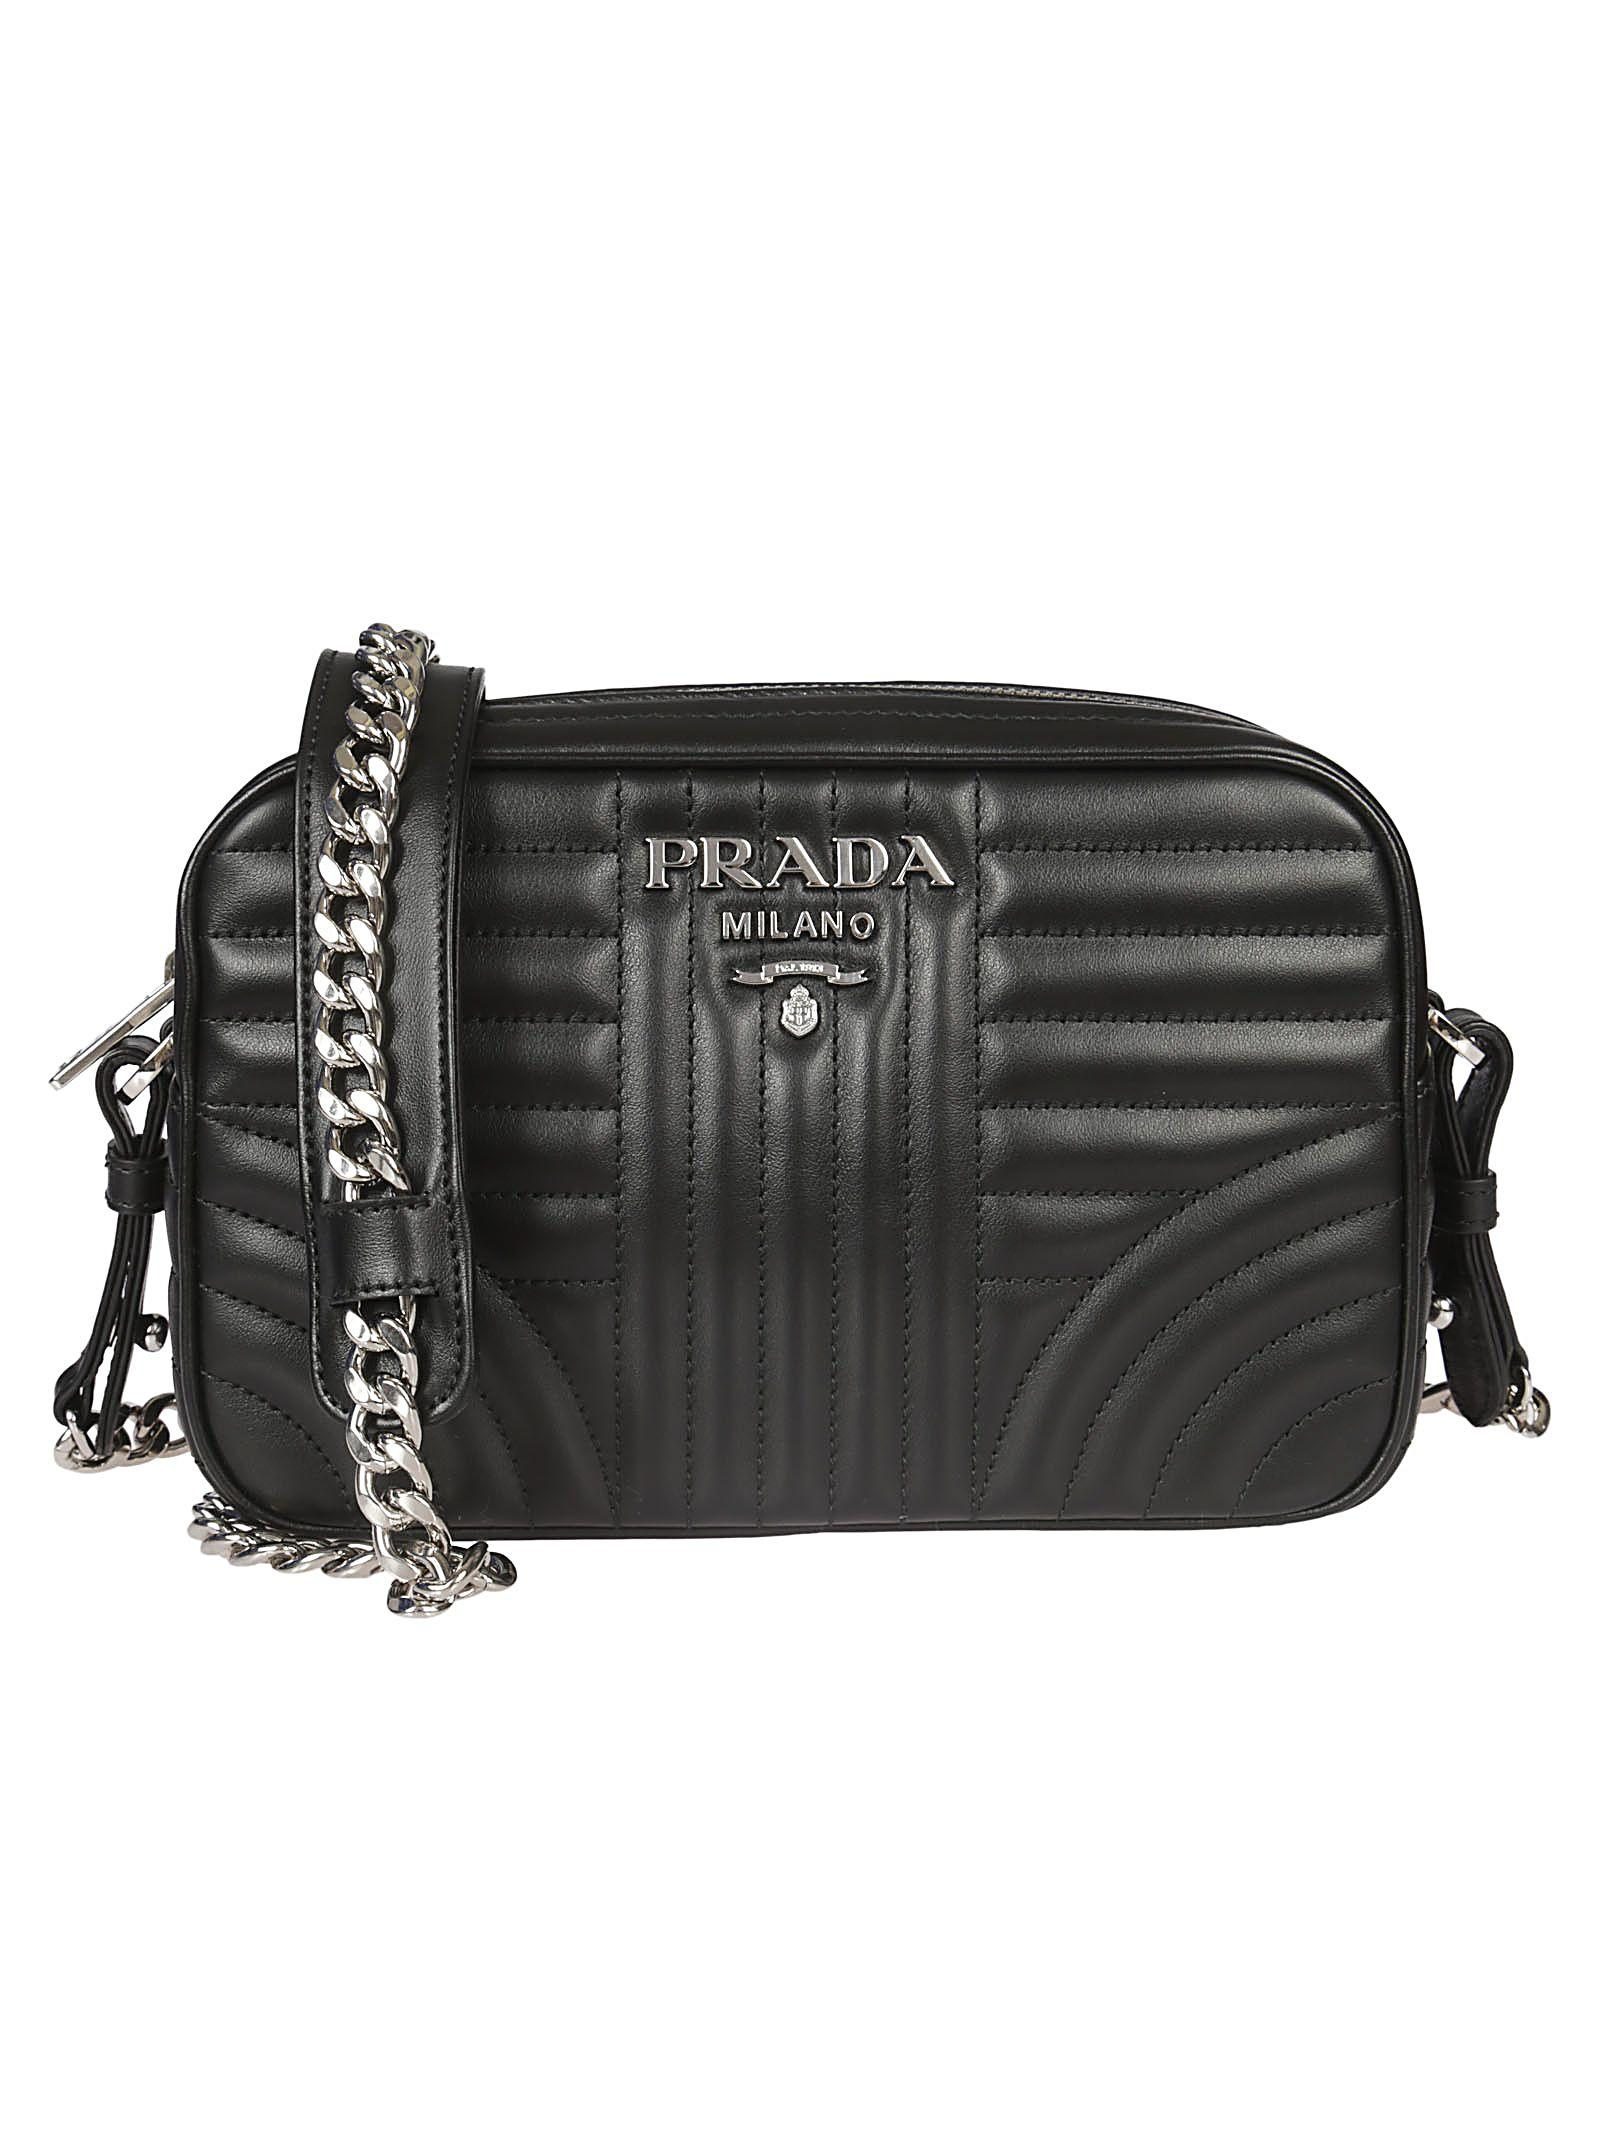 Prada Beveled Camera Shoulder Bag